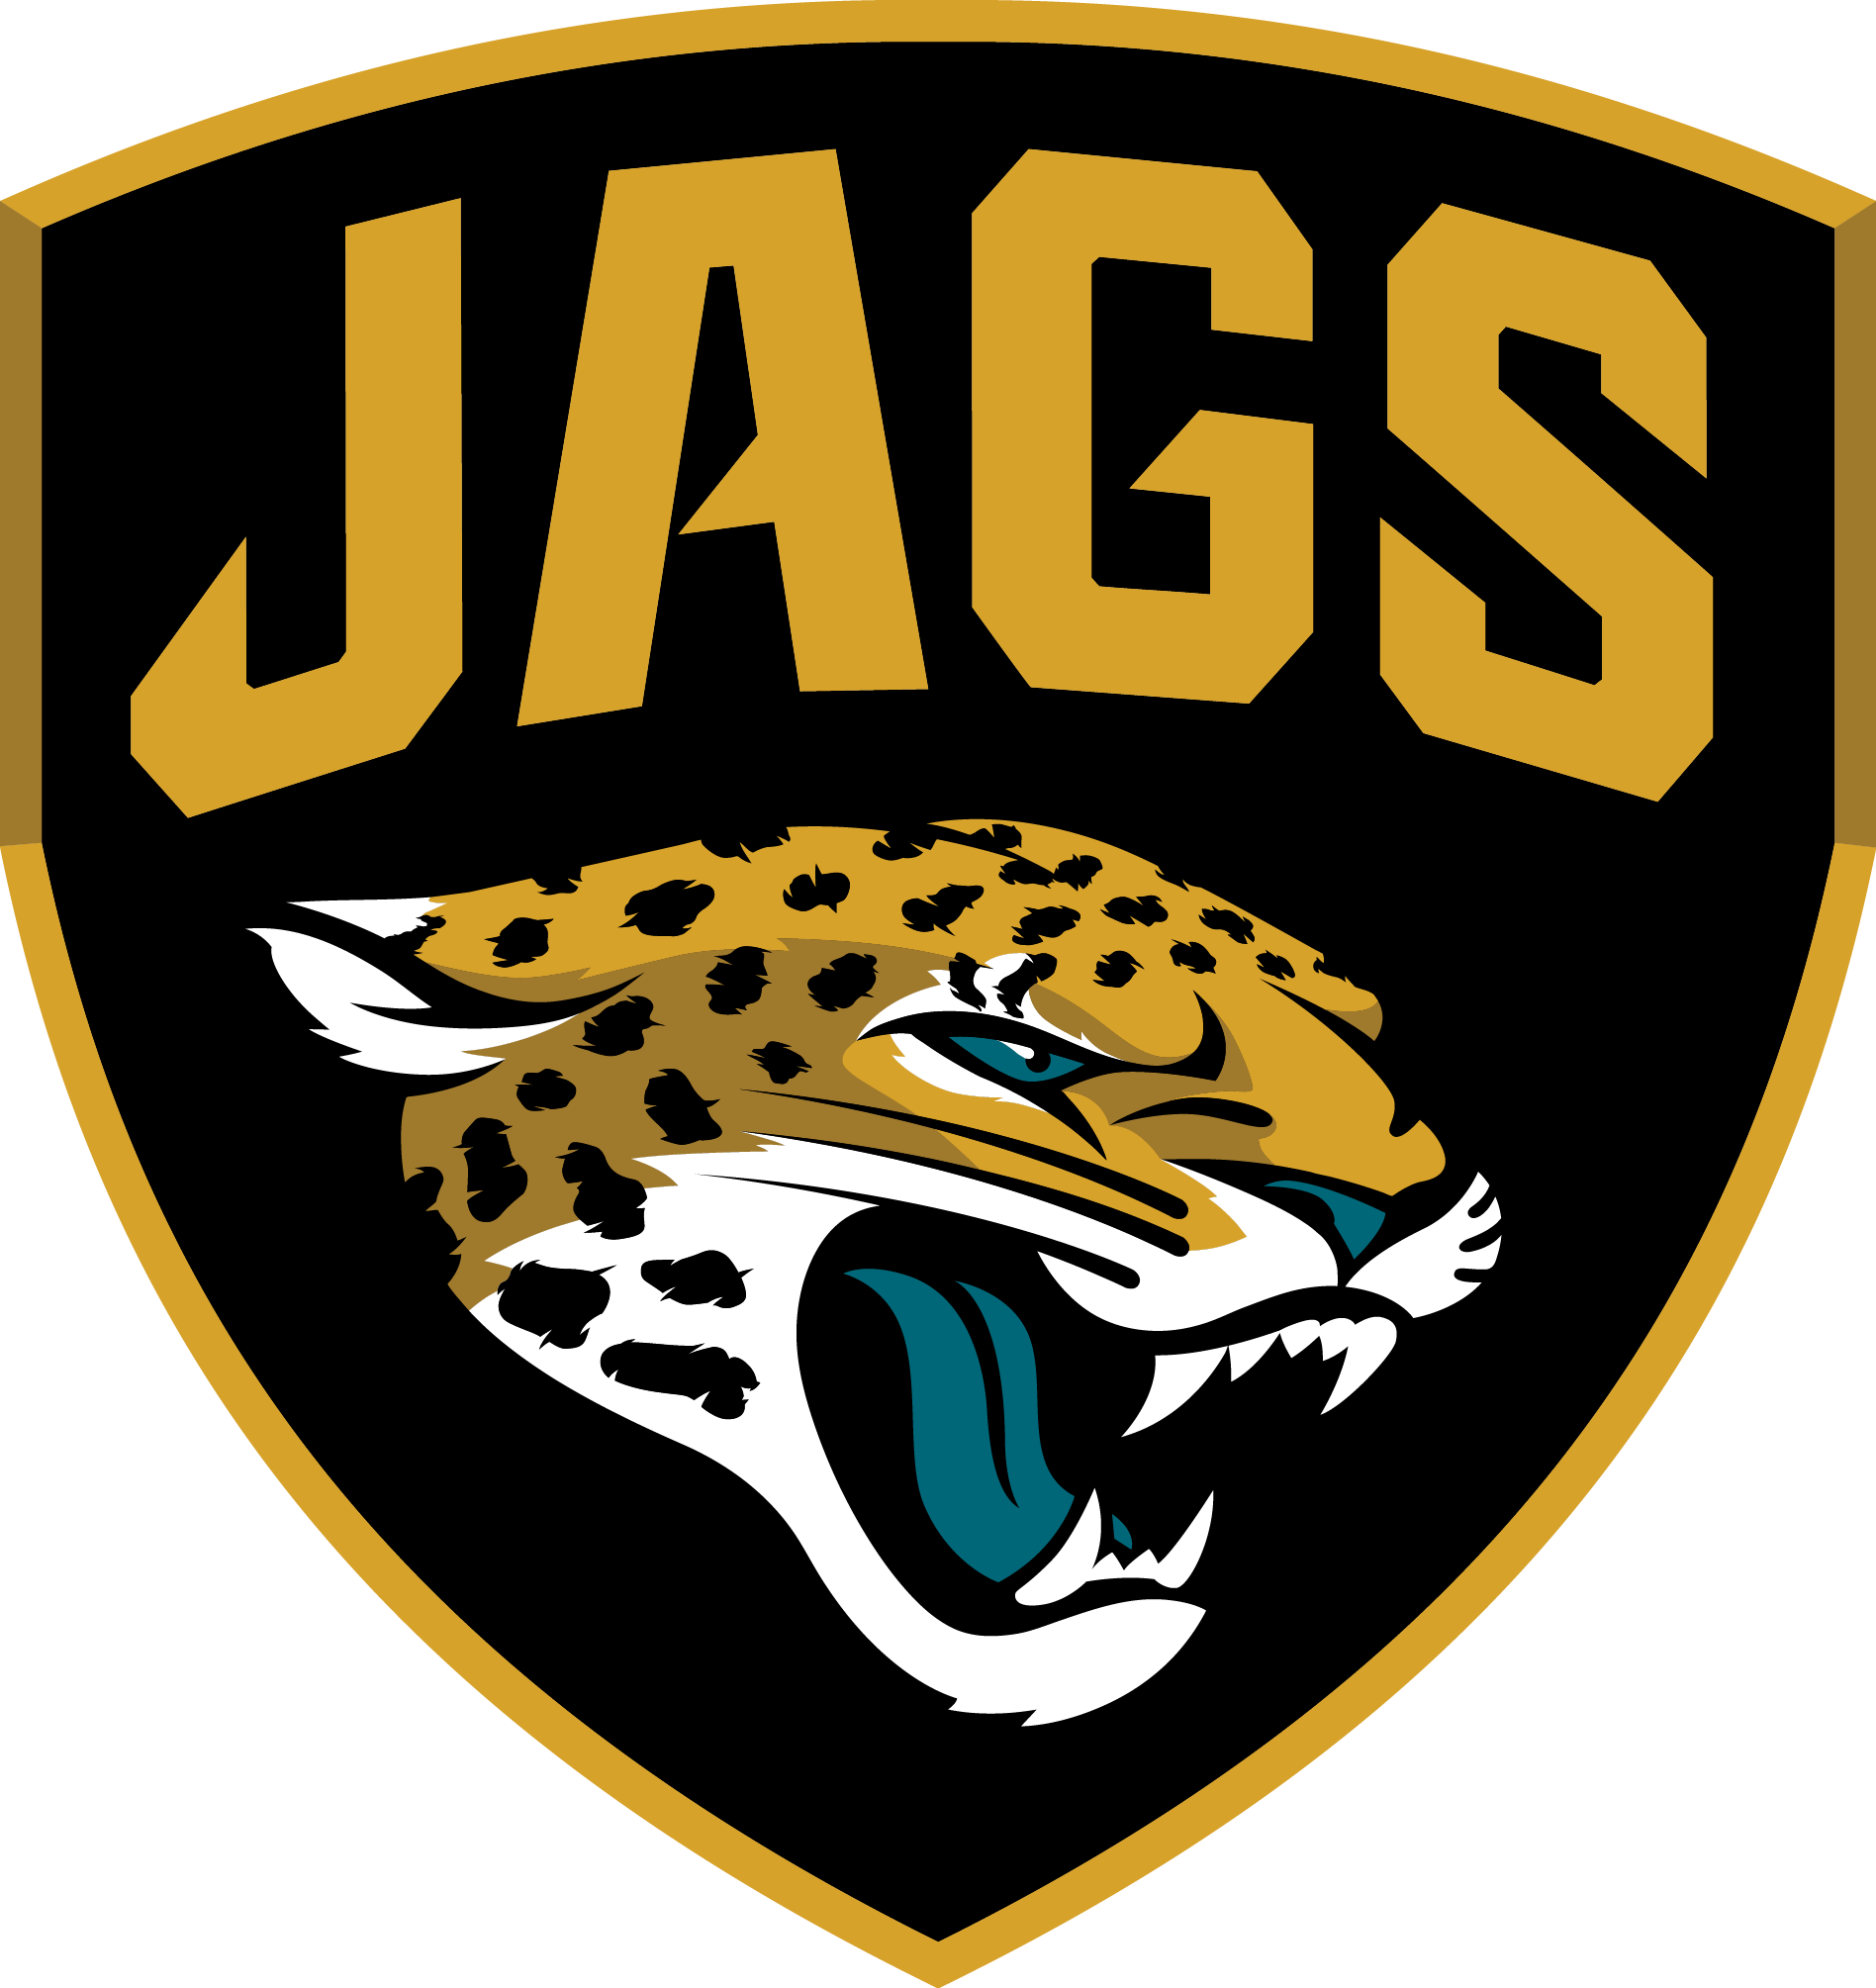 Jaguar football clipart clip black and white download jacksonville jaguars - Google Search | Love My Jacksonville Jaguars ... clip black and white download